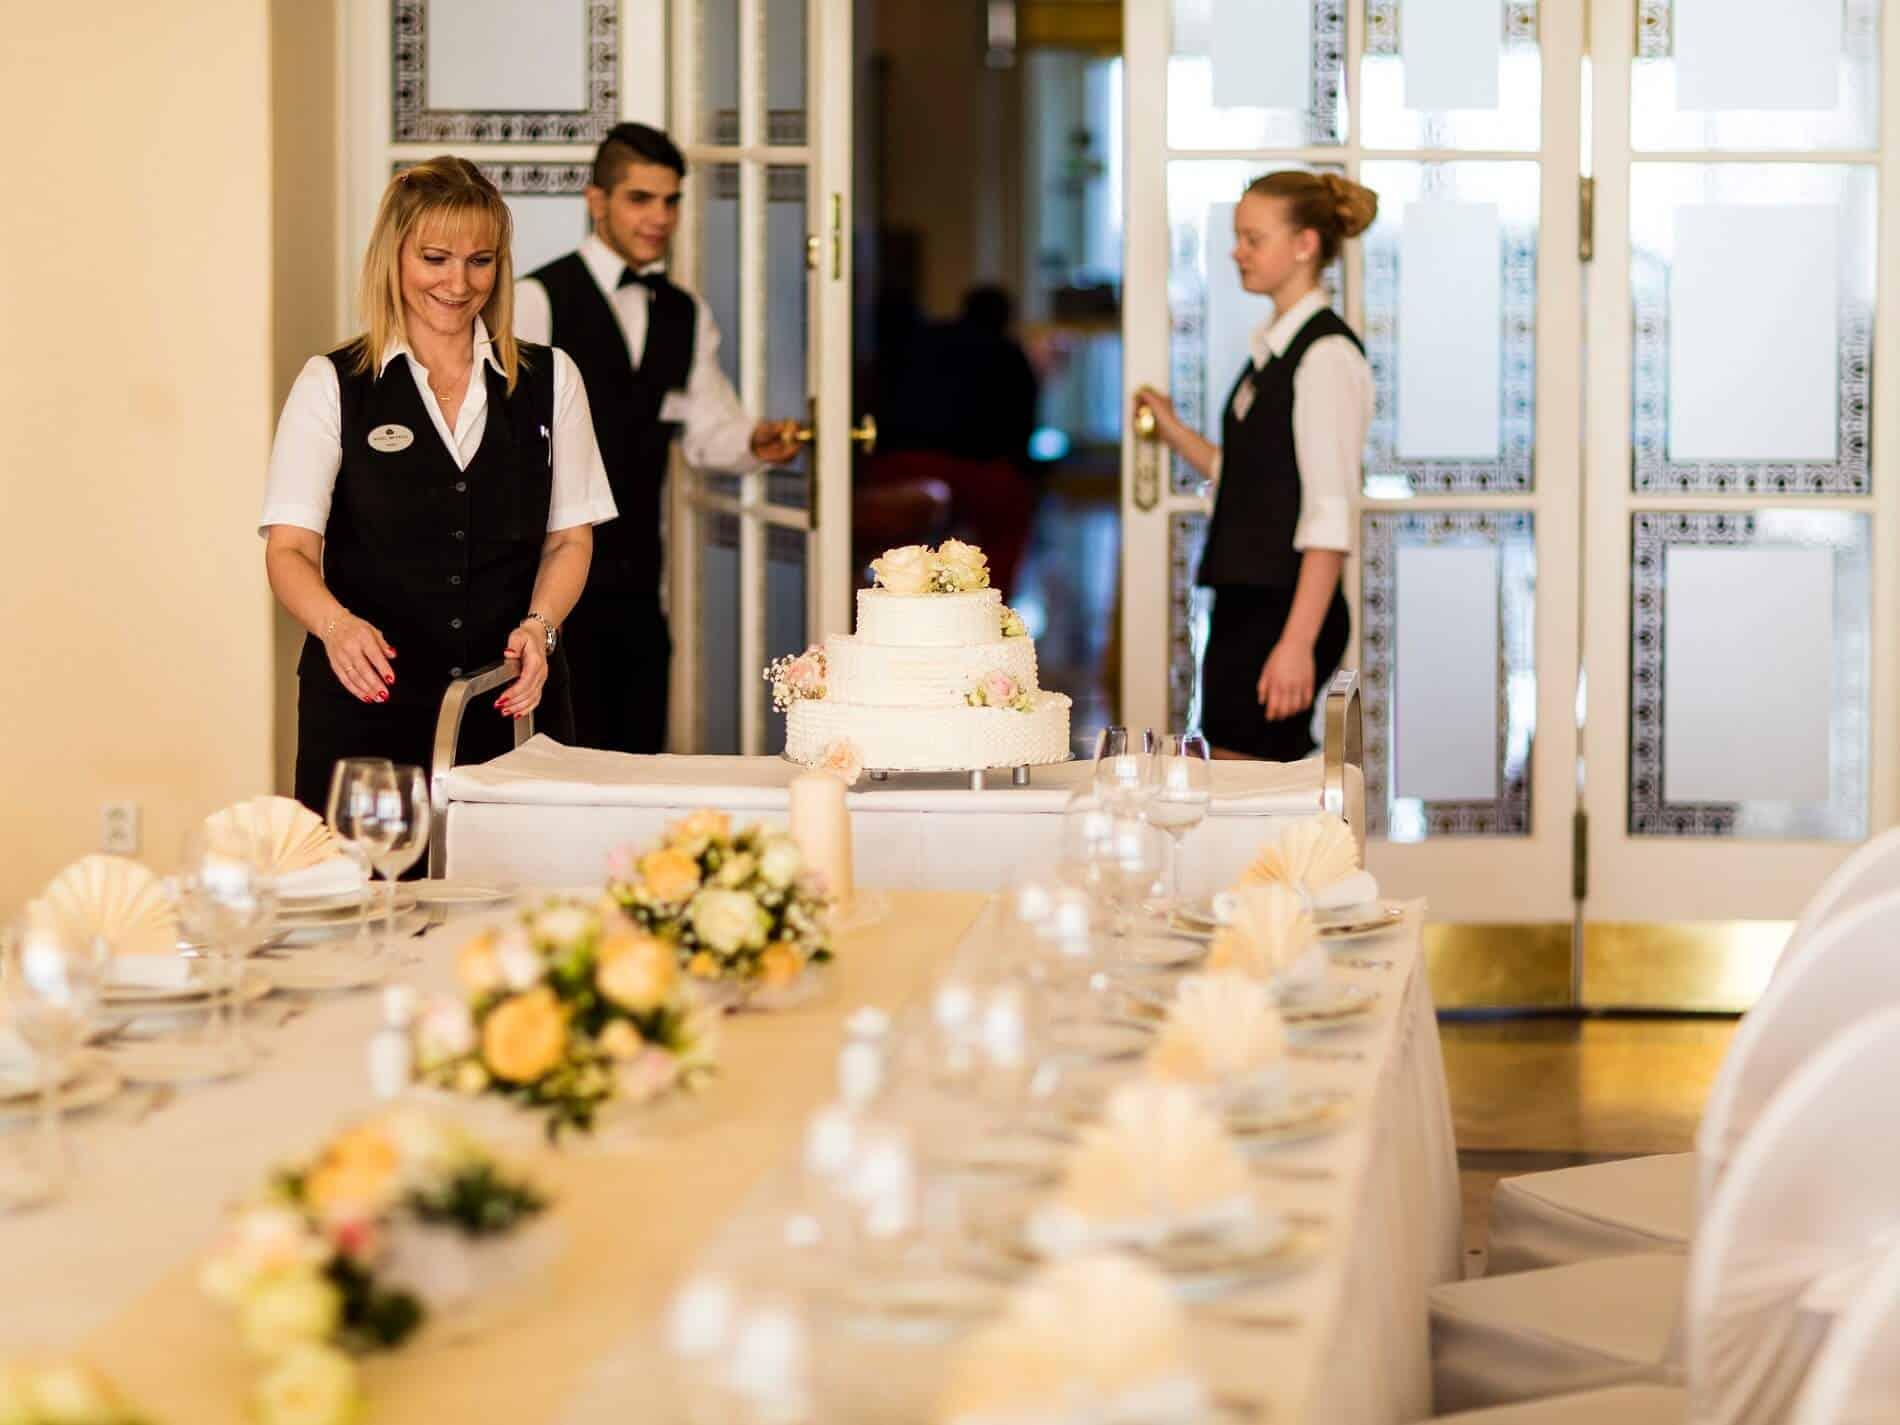 Imperial - svatební hostina výzdoba